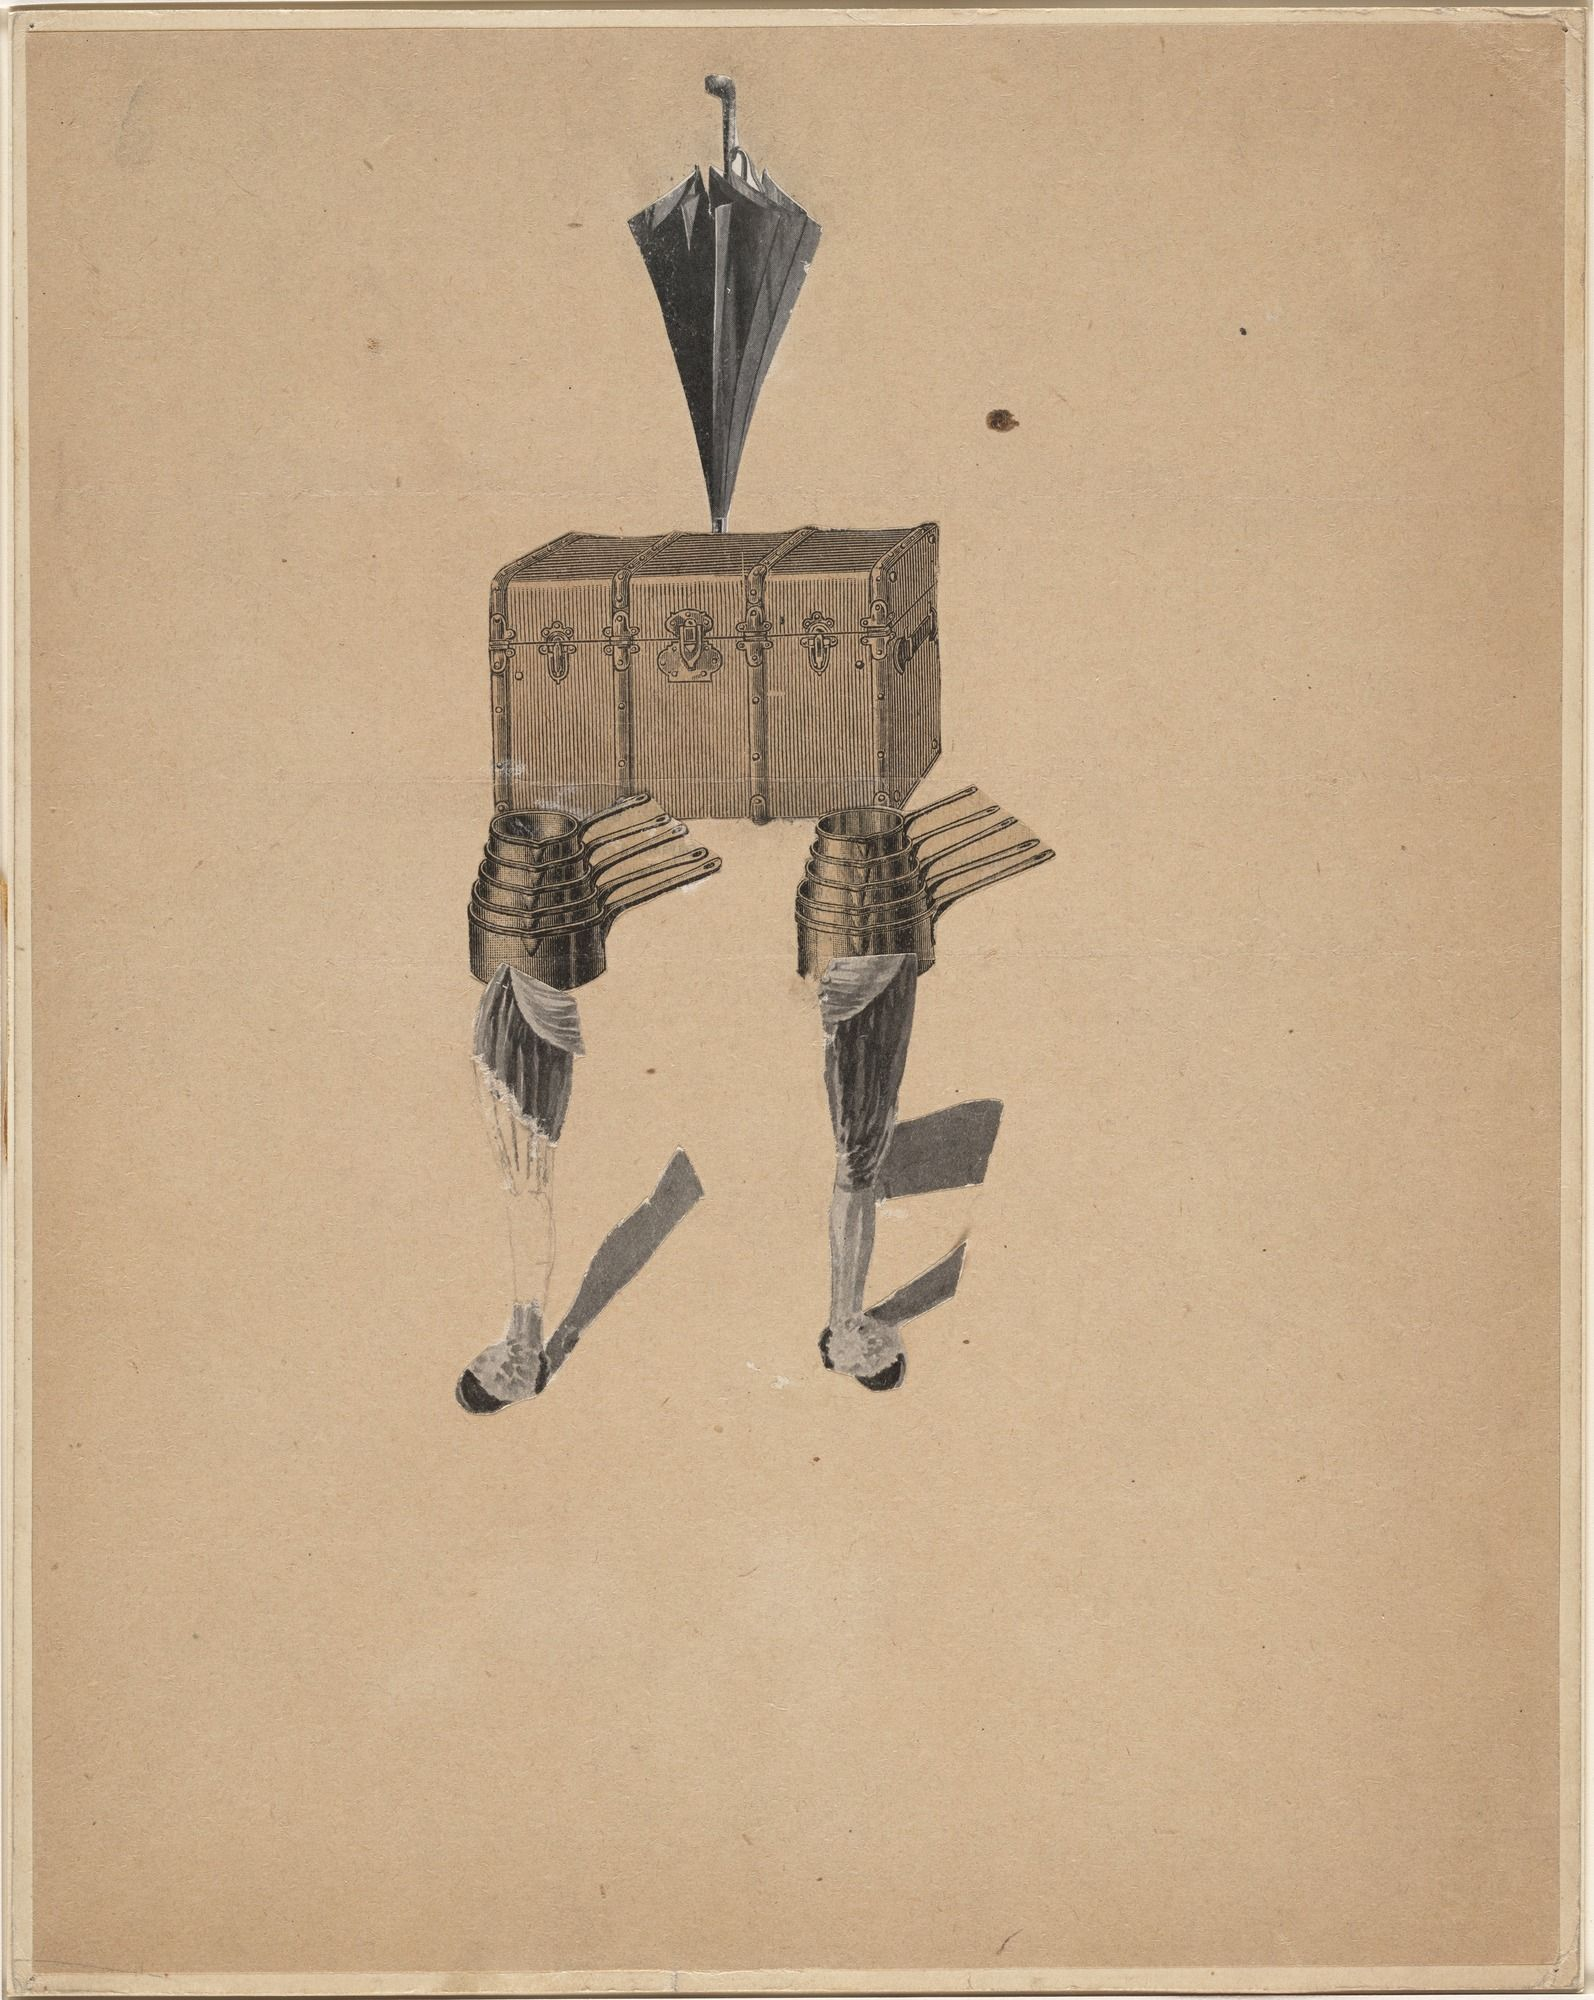 Cadavre Exquis, André Breton, Max Morise,